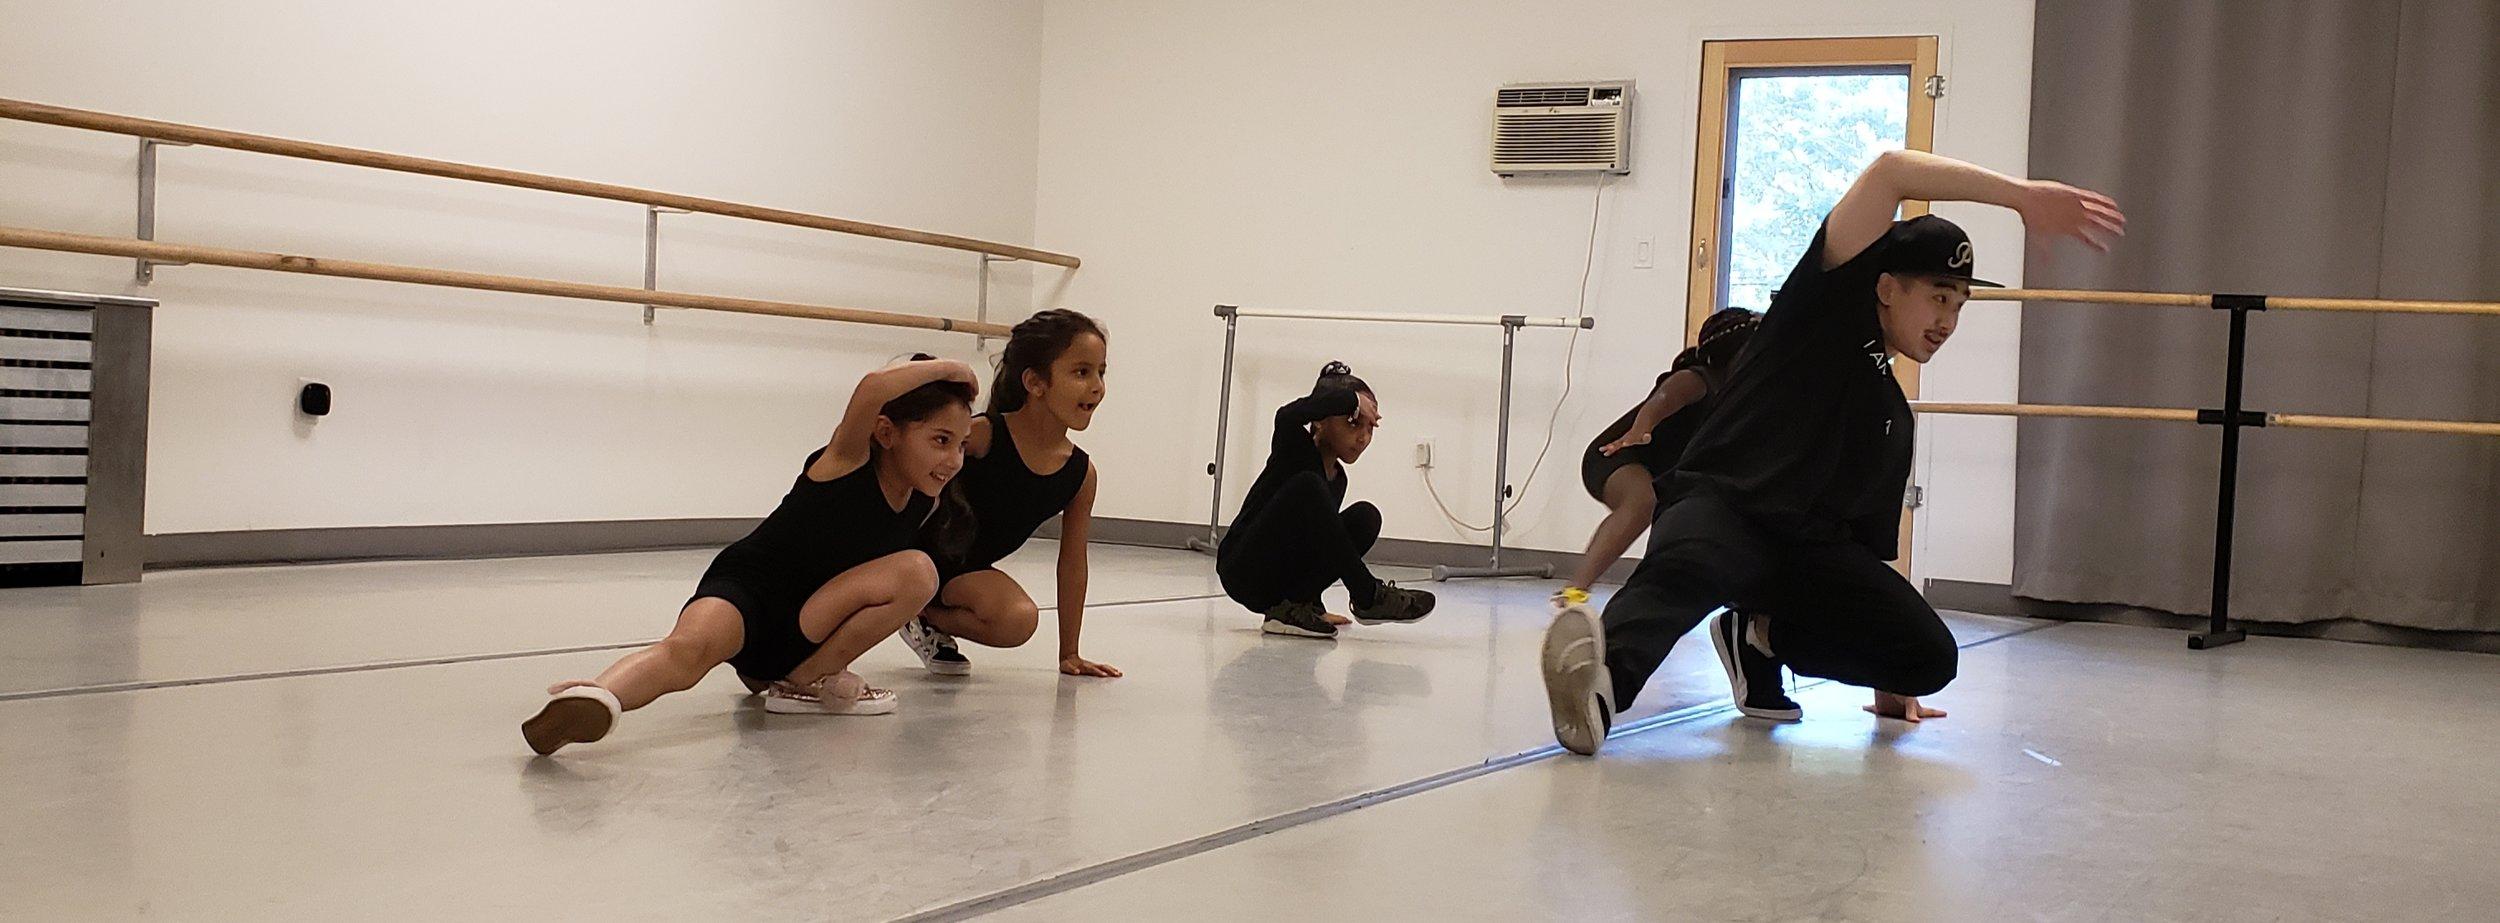 Hip hop teacher, Adam Tan, demonstrates the basics of break dancing to Level 2 students.